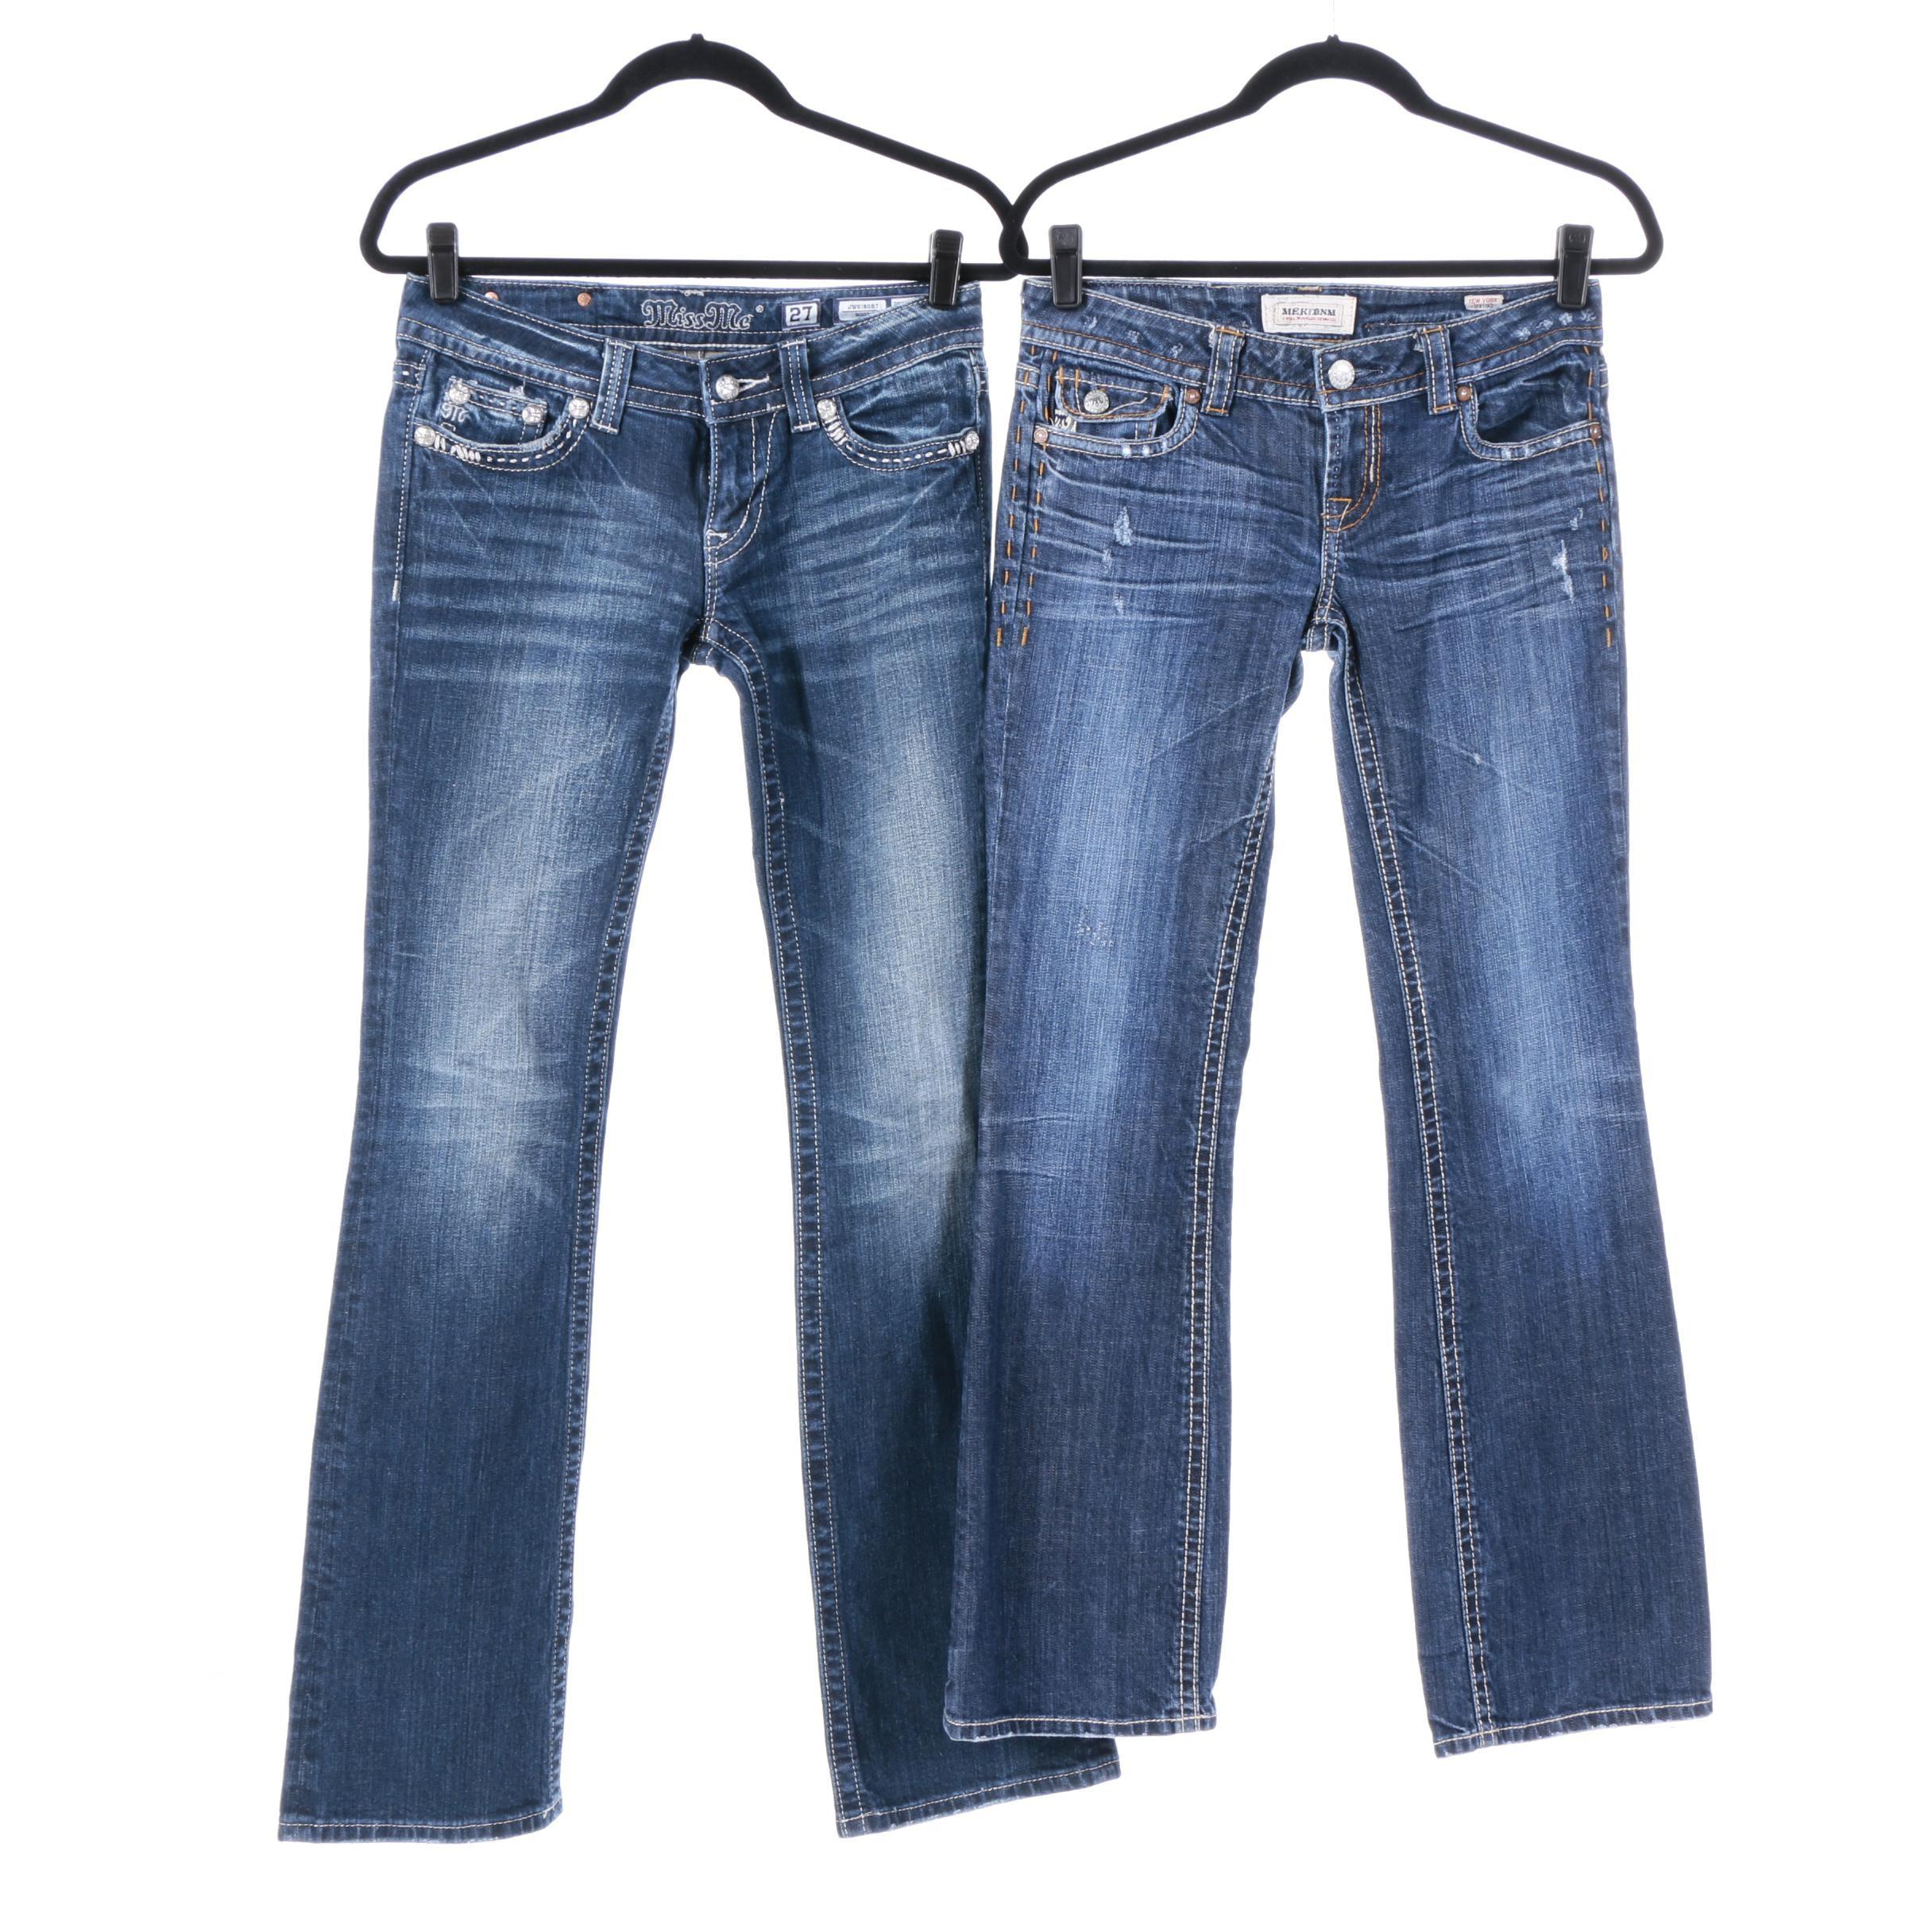 Women's Jeans Including Miss Me and Mek Denim